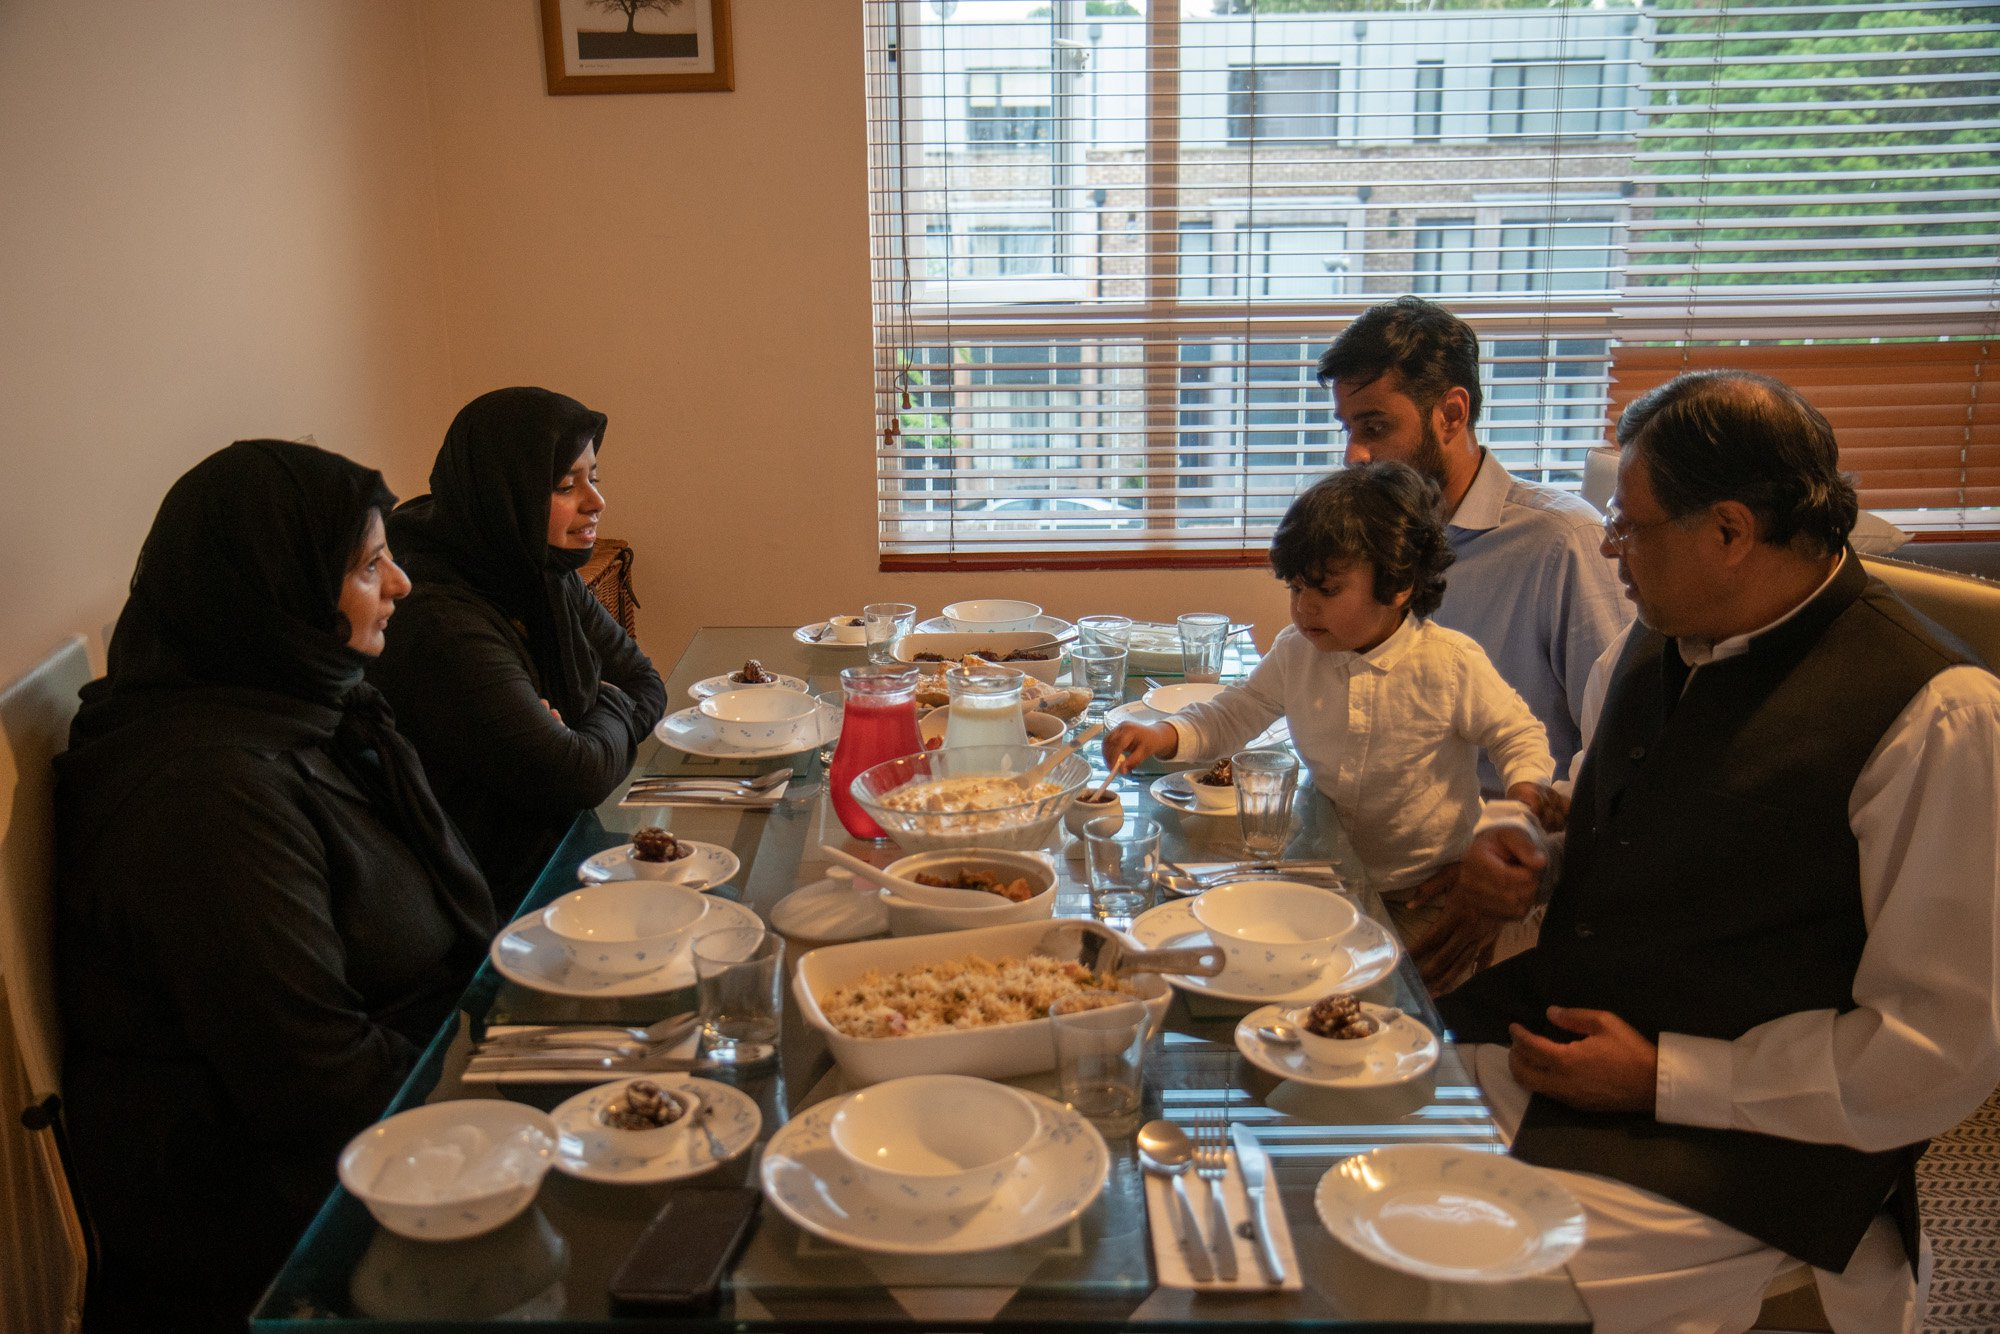 Muslims Who Fast: Quddus, an Ahmadiyya imam, celebrates Ramadan with his family